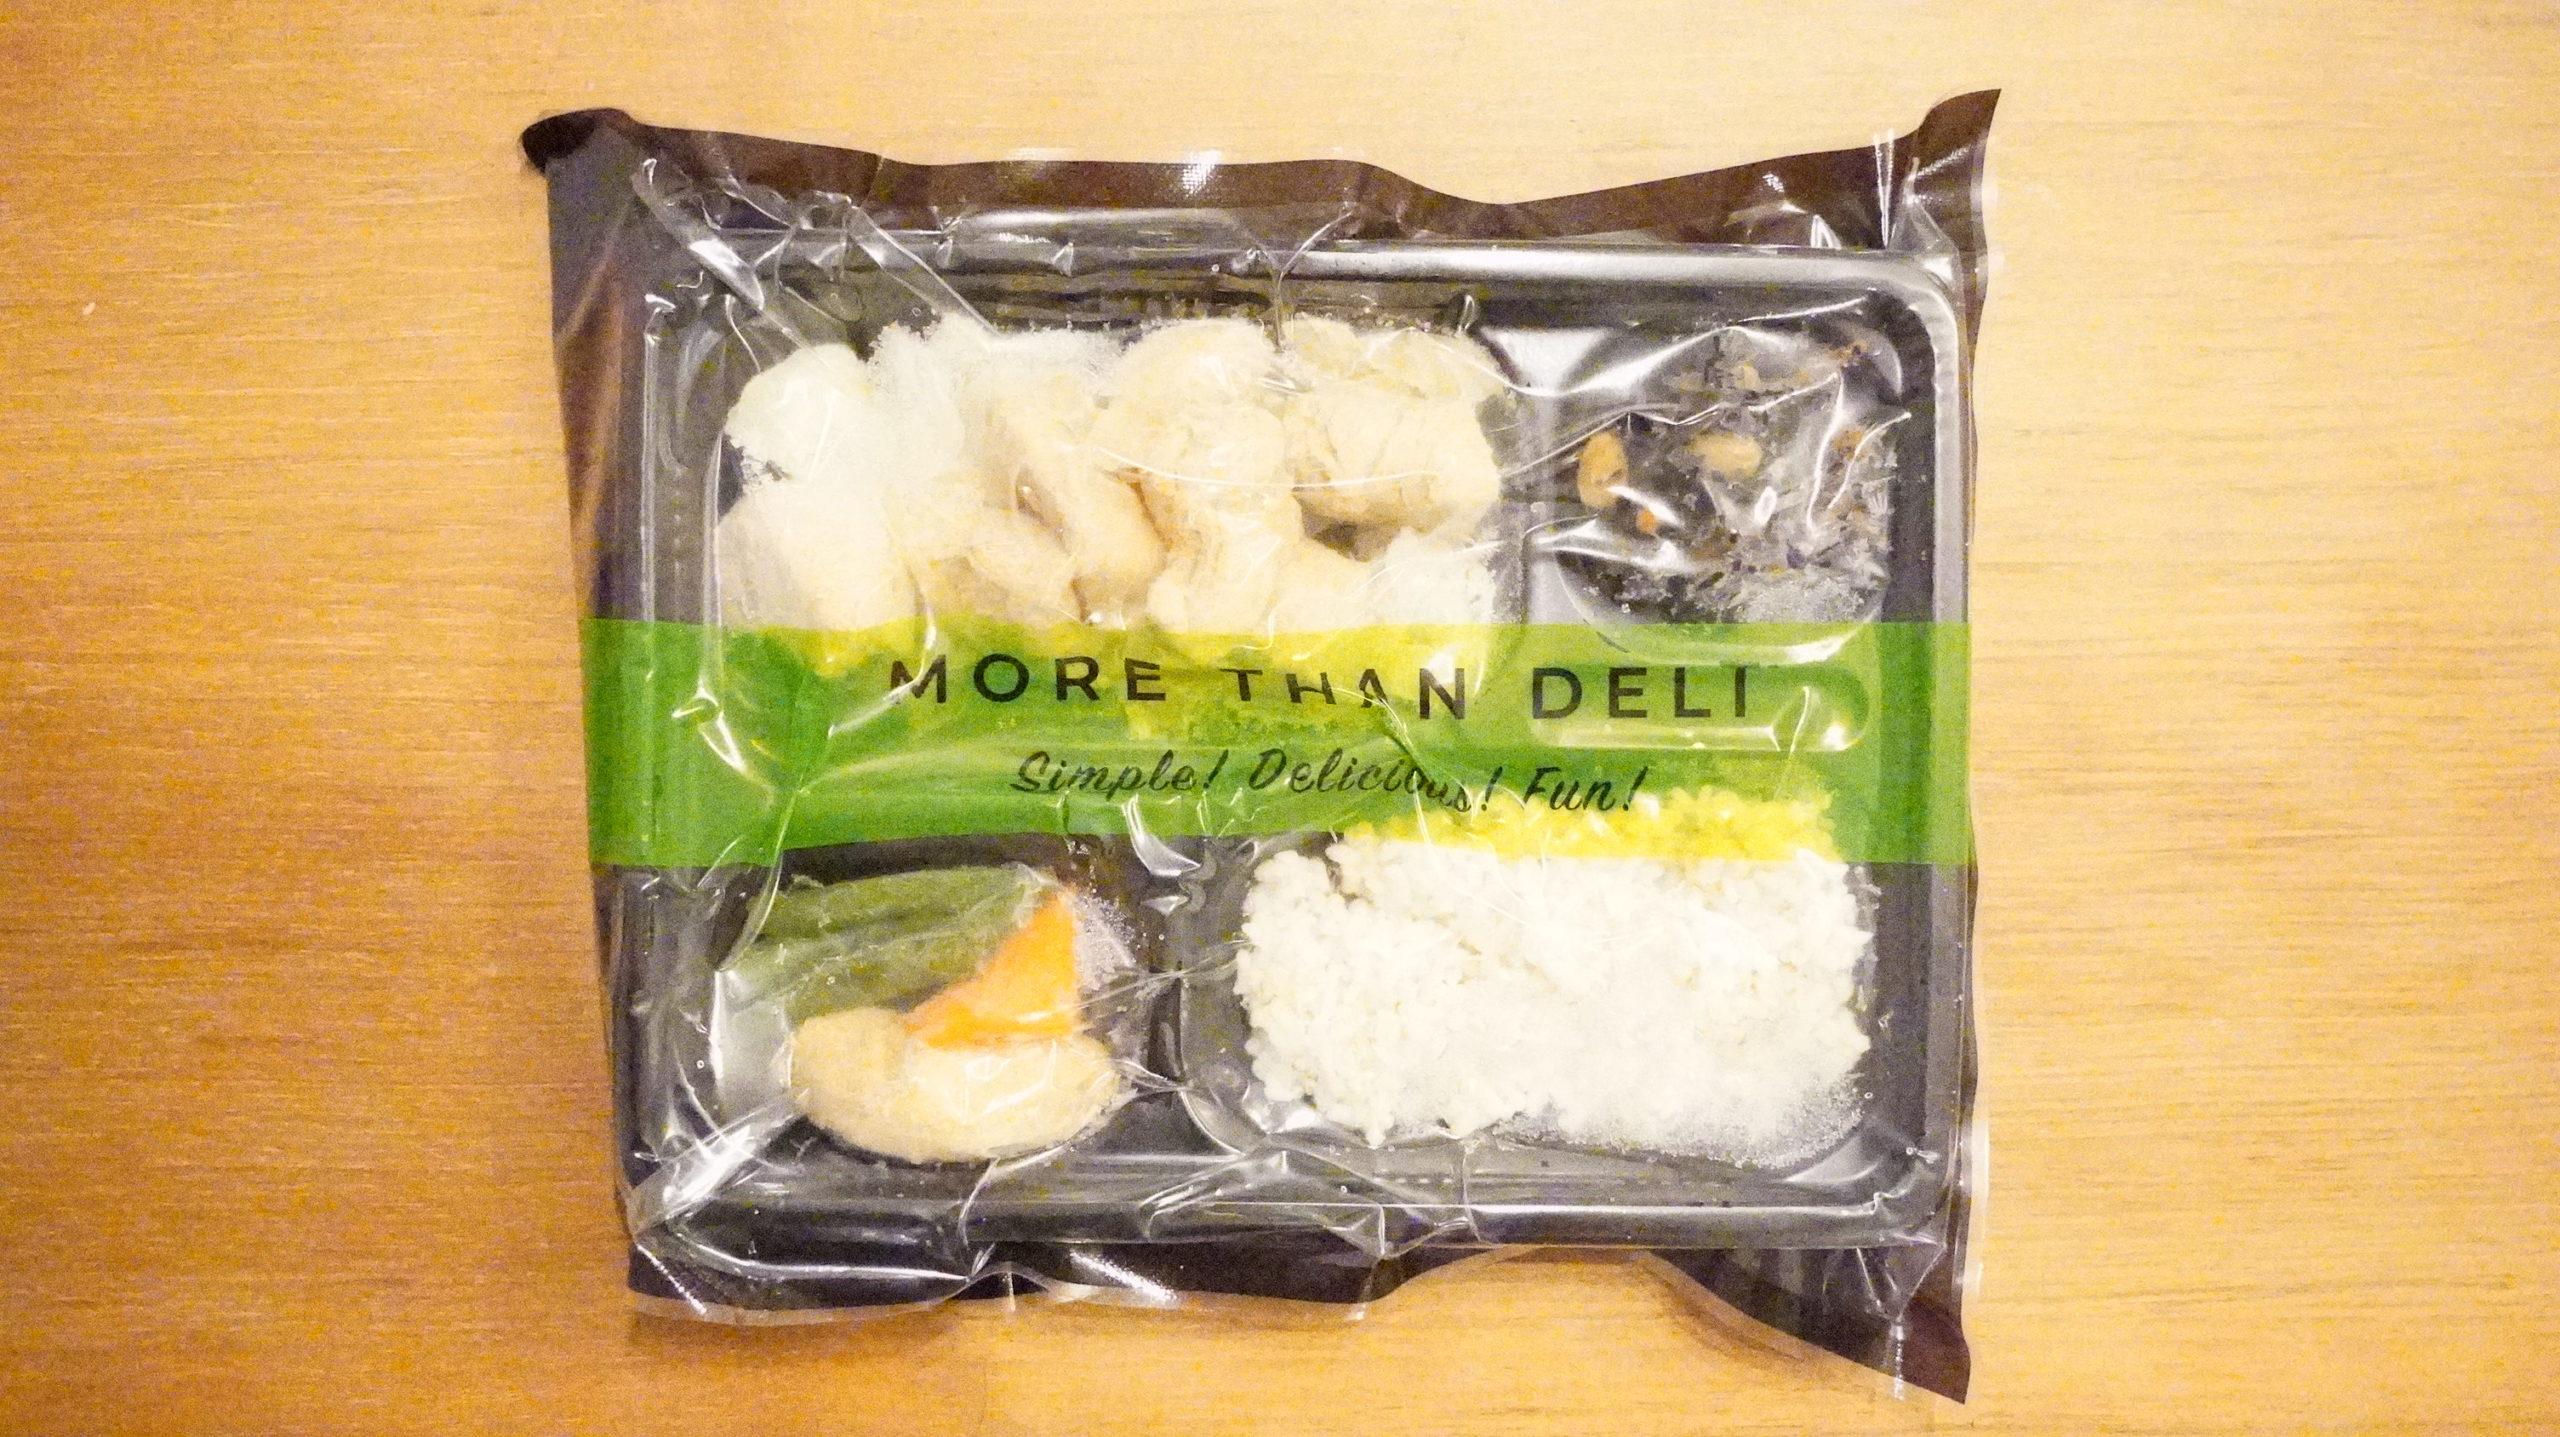 More than Deli(モアザンデリ)の冷凍弁当「鶏肉の生姜焼き」のパッケージ写真